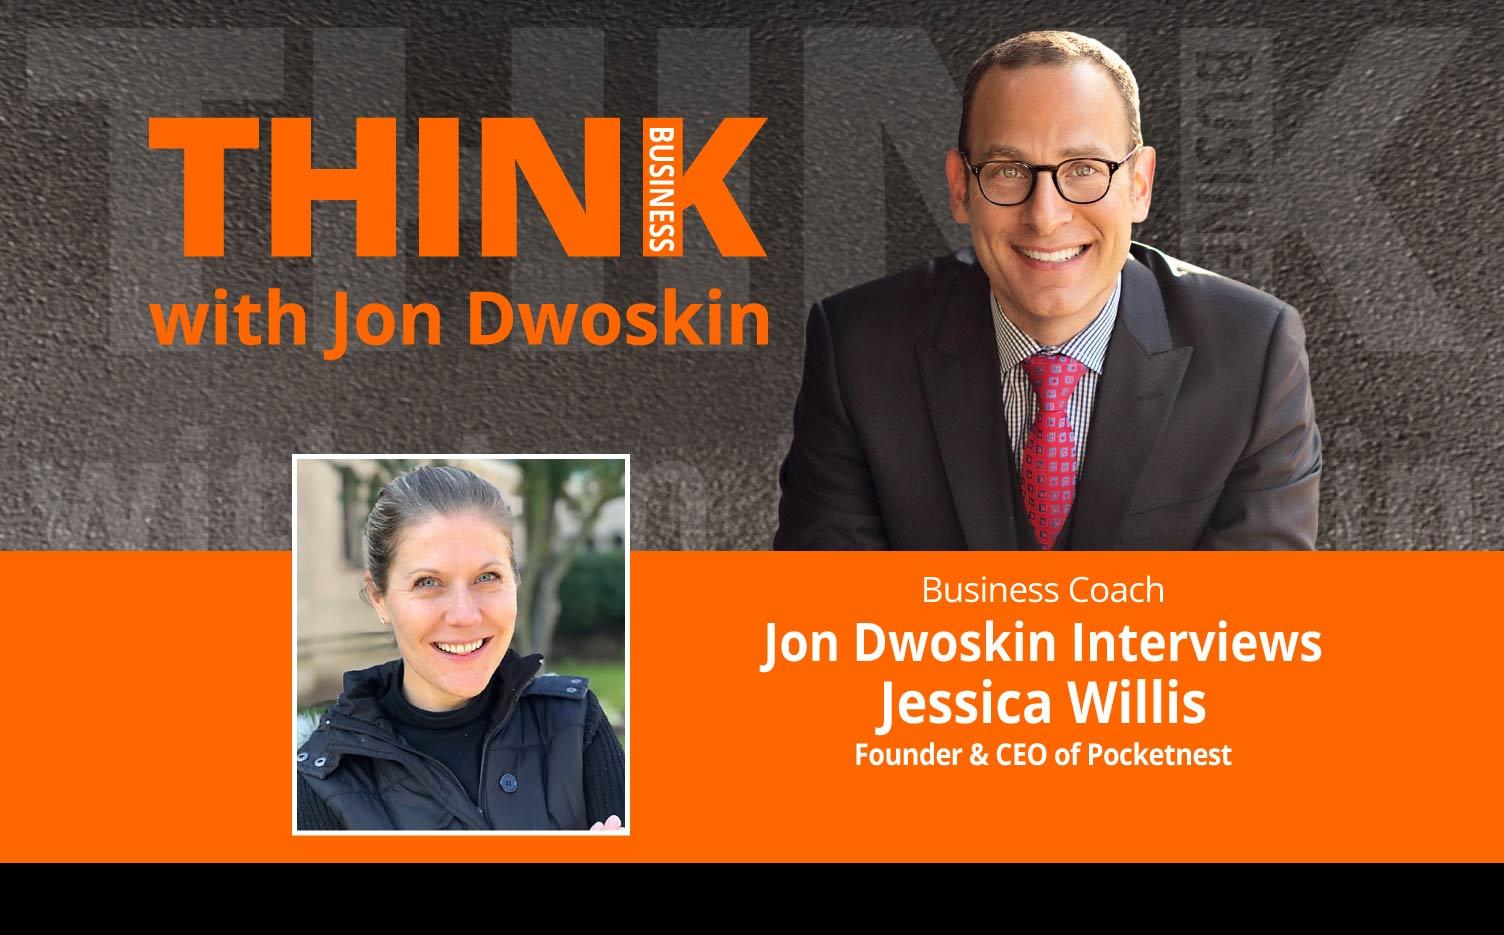 THINK Business Podcast: Jon Dwoskin Interviews Jessica Willis, Founder & CEO of Pocketnest